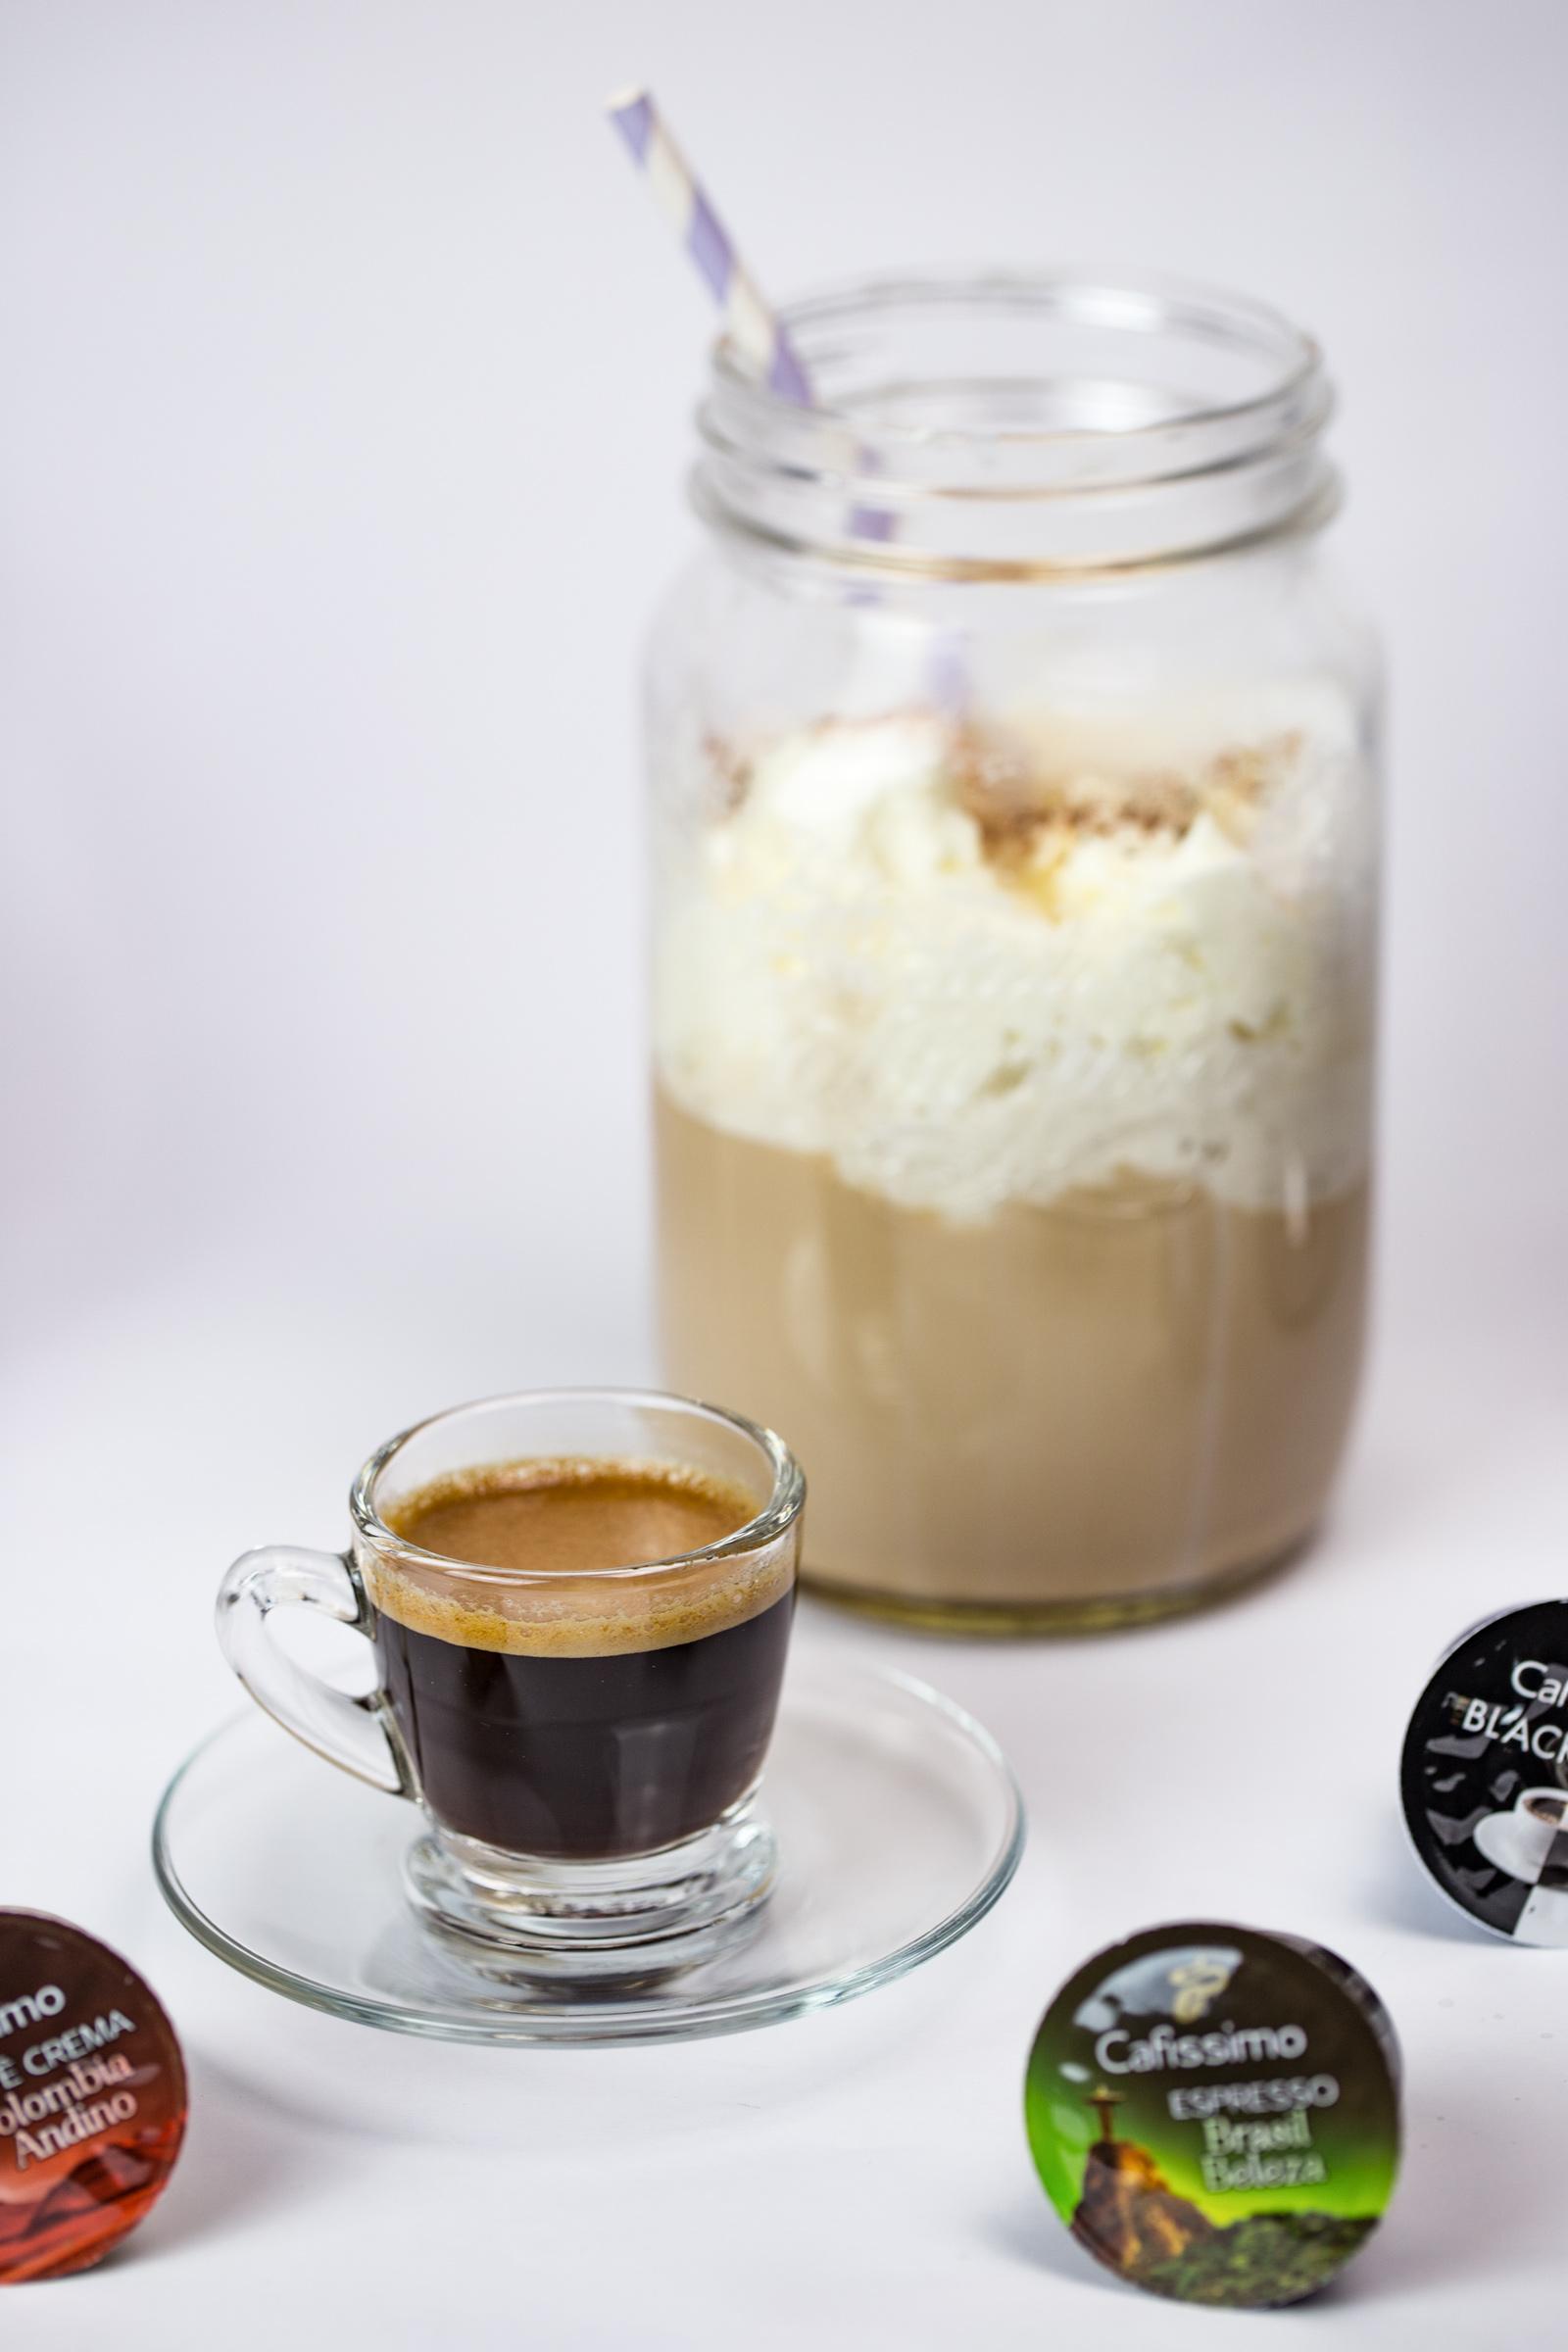 Nadja_Nemetz_Rezept_iced_caffe_latte_vanille_eis_vanilleeis_tchibo_eduscho_3